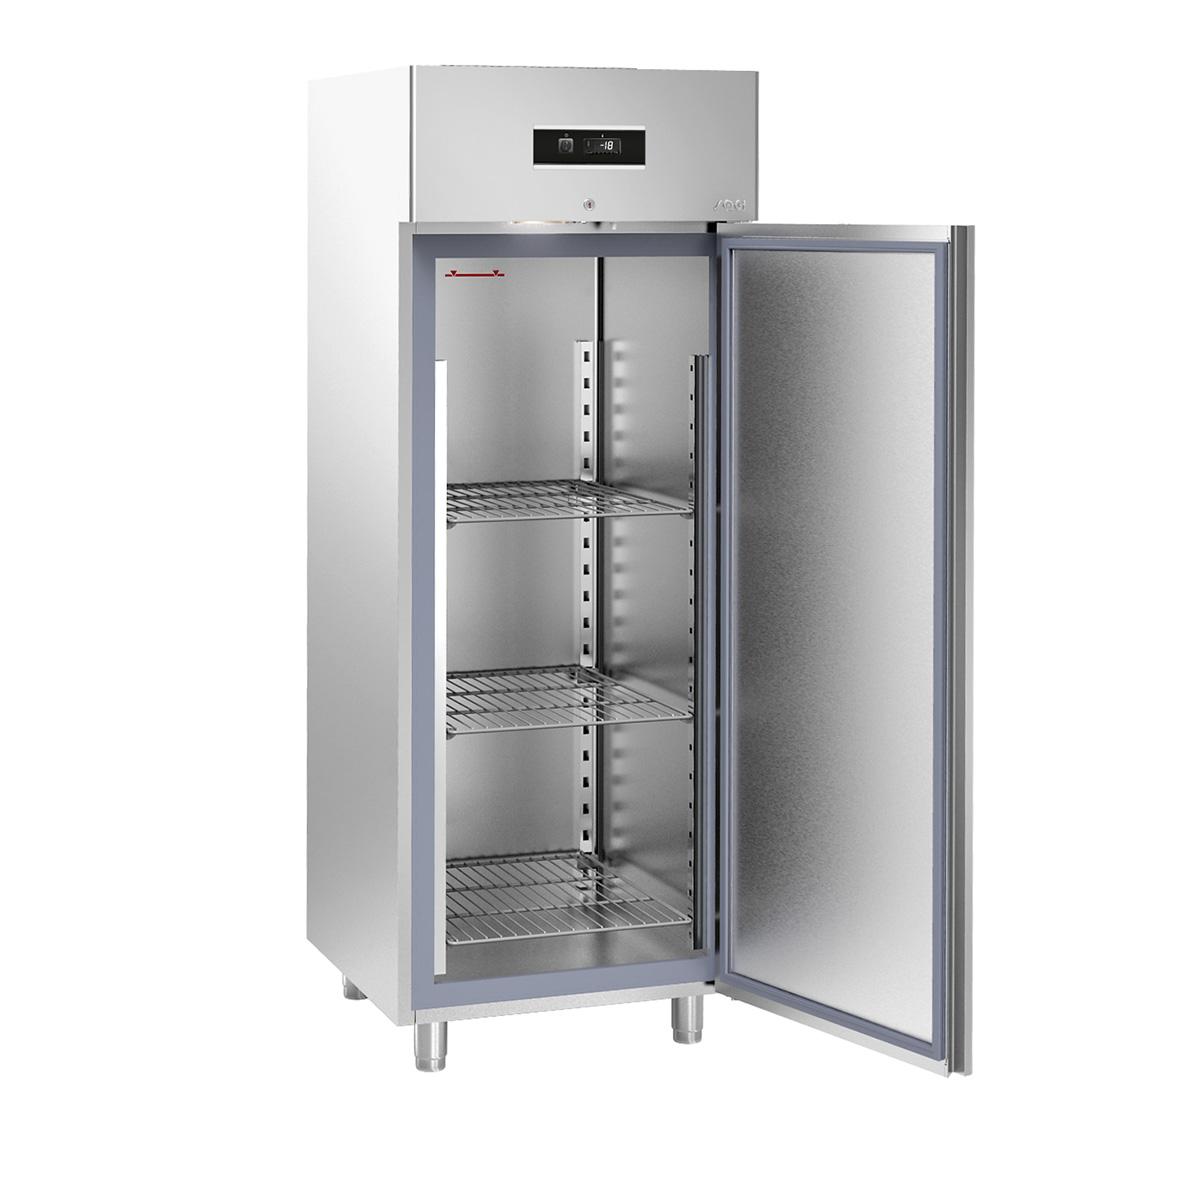 Sagi-Freezer-Supplier-In-UAE